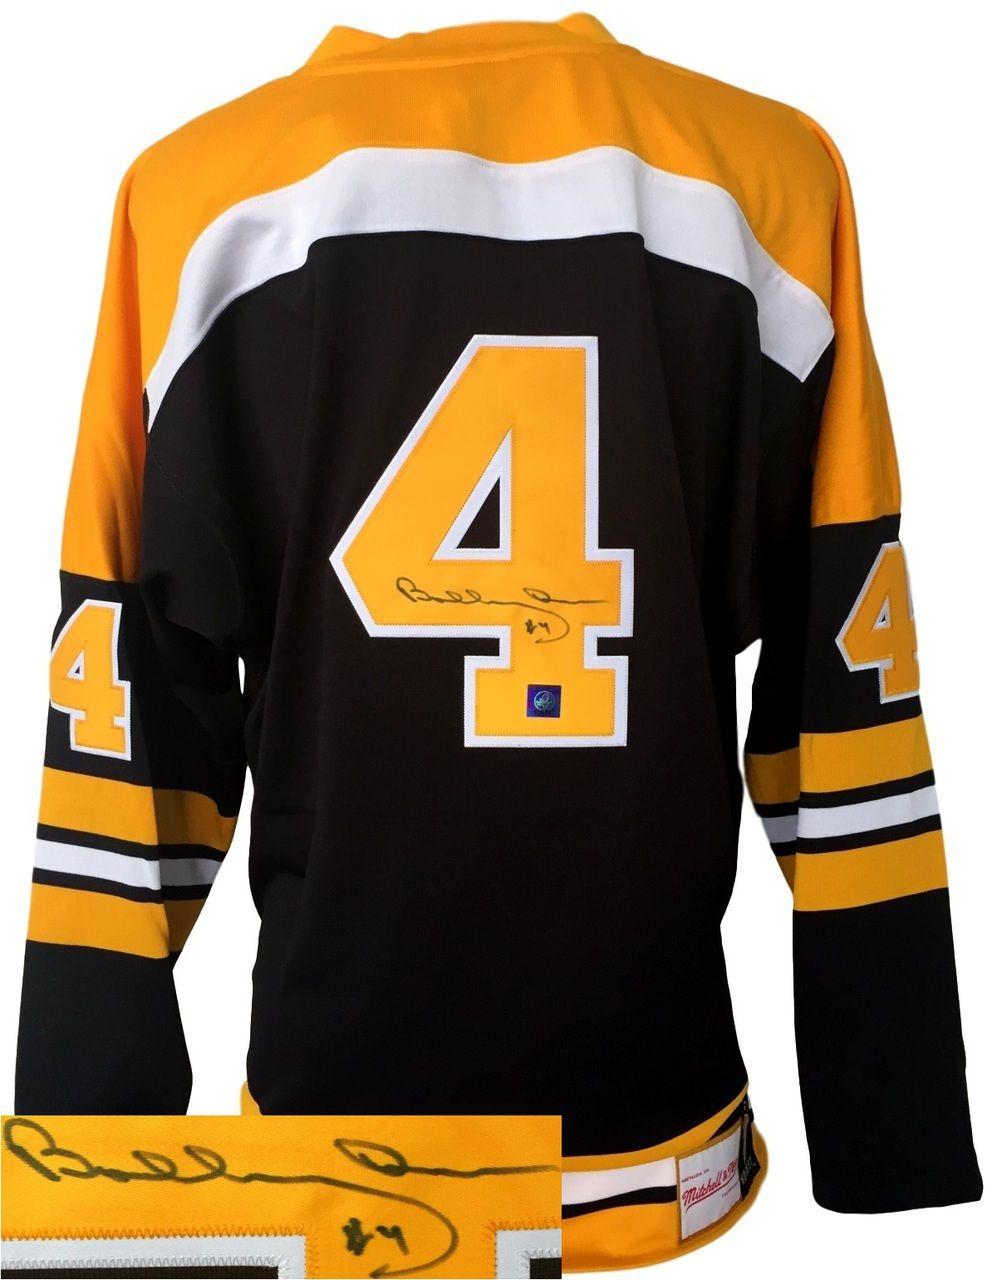 e08d1ac6 nhl jerseys boston bruins 16 marco sturm 2010 nhl winter classic premier  jersey